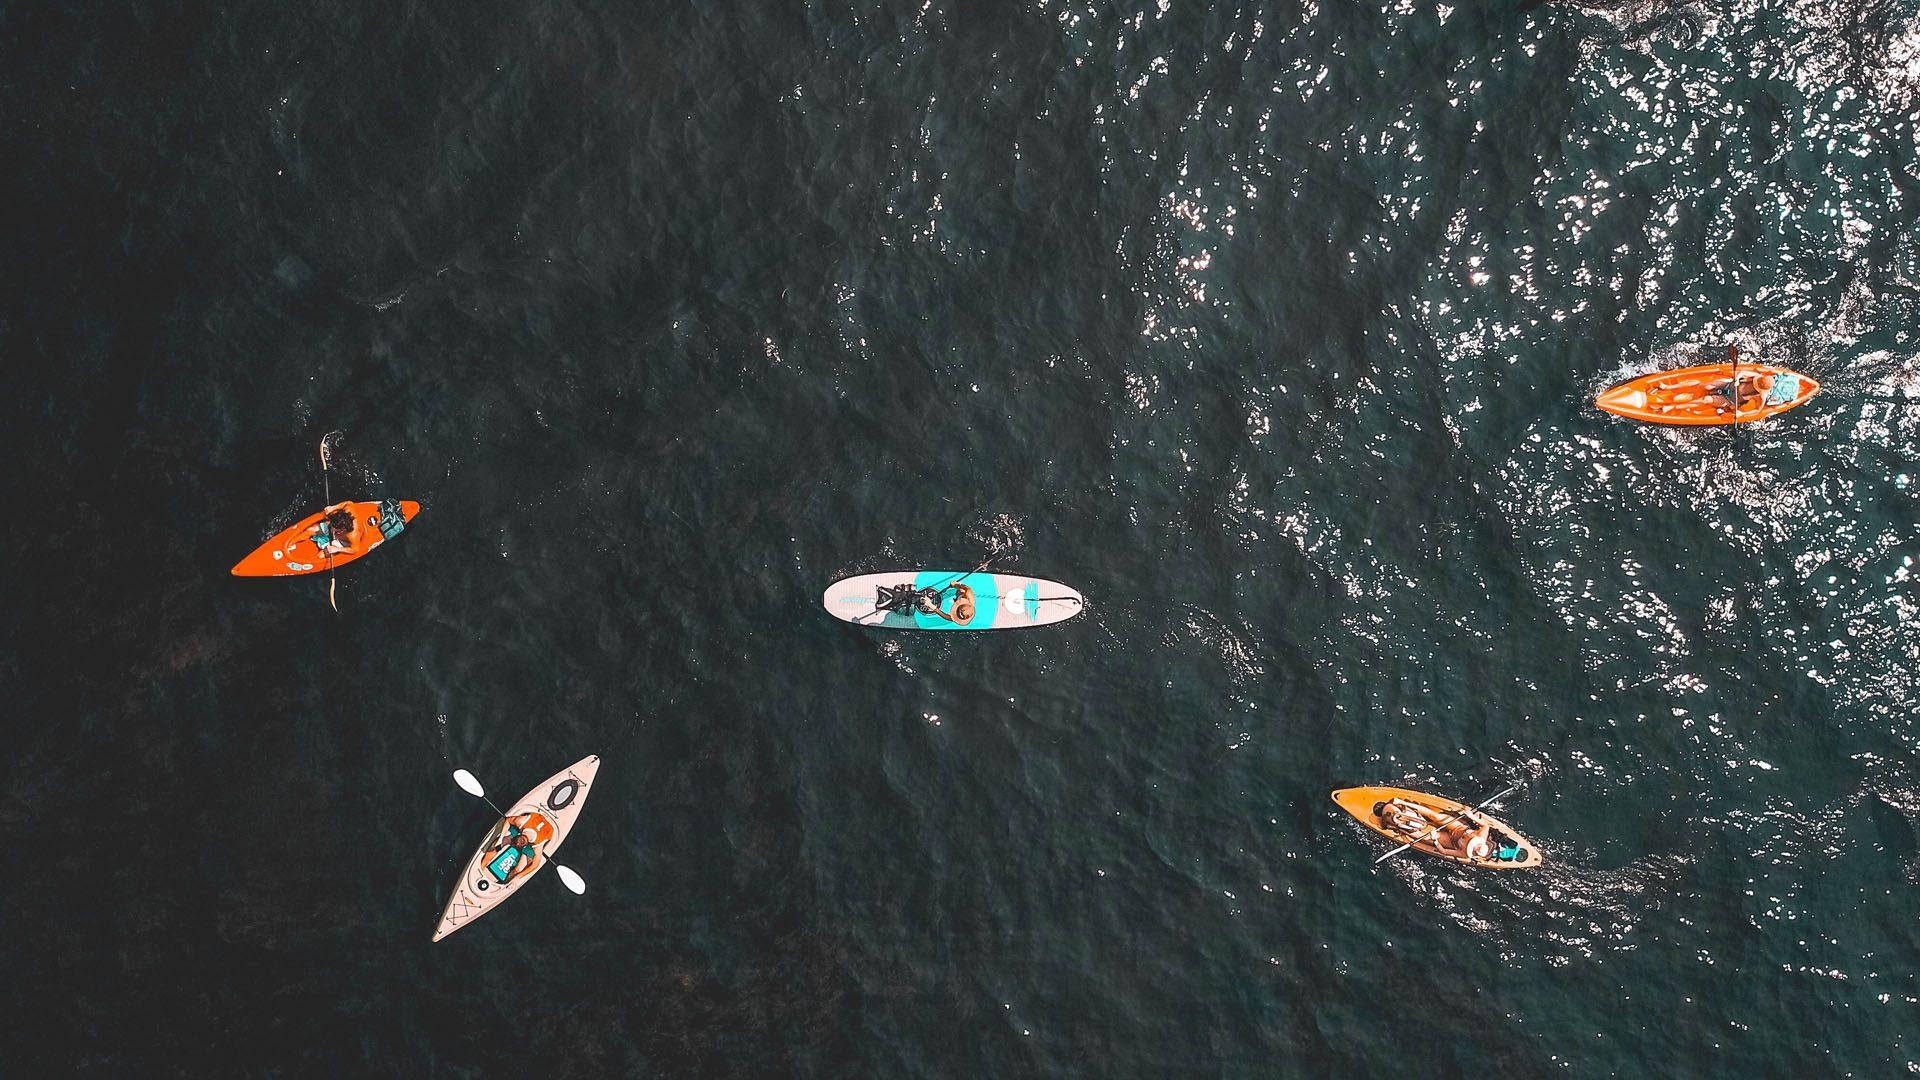 Aerial photo of kayaks